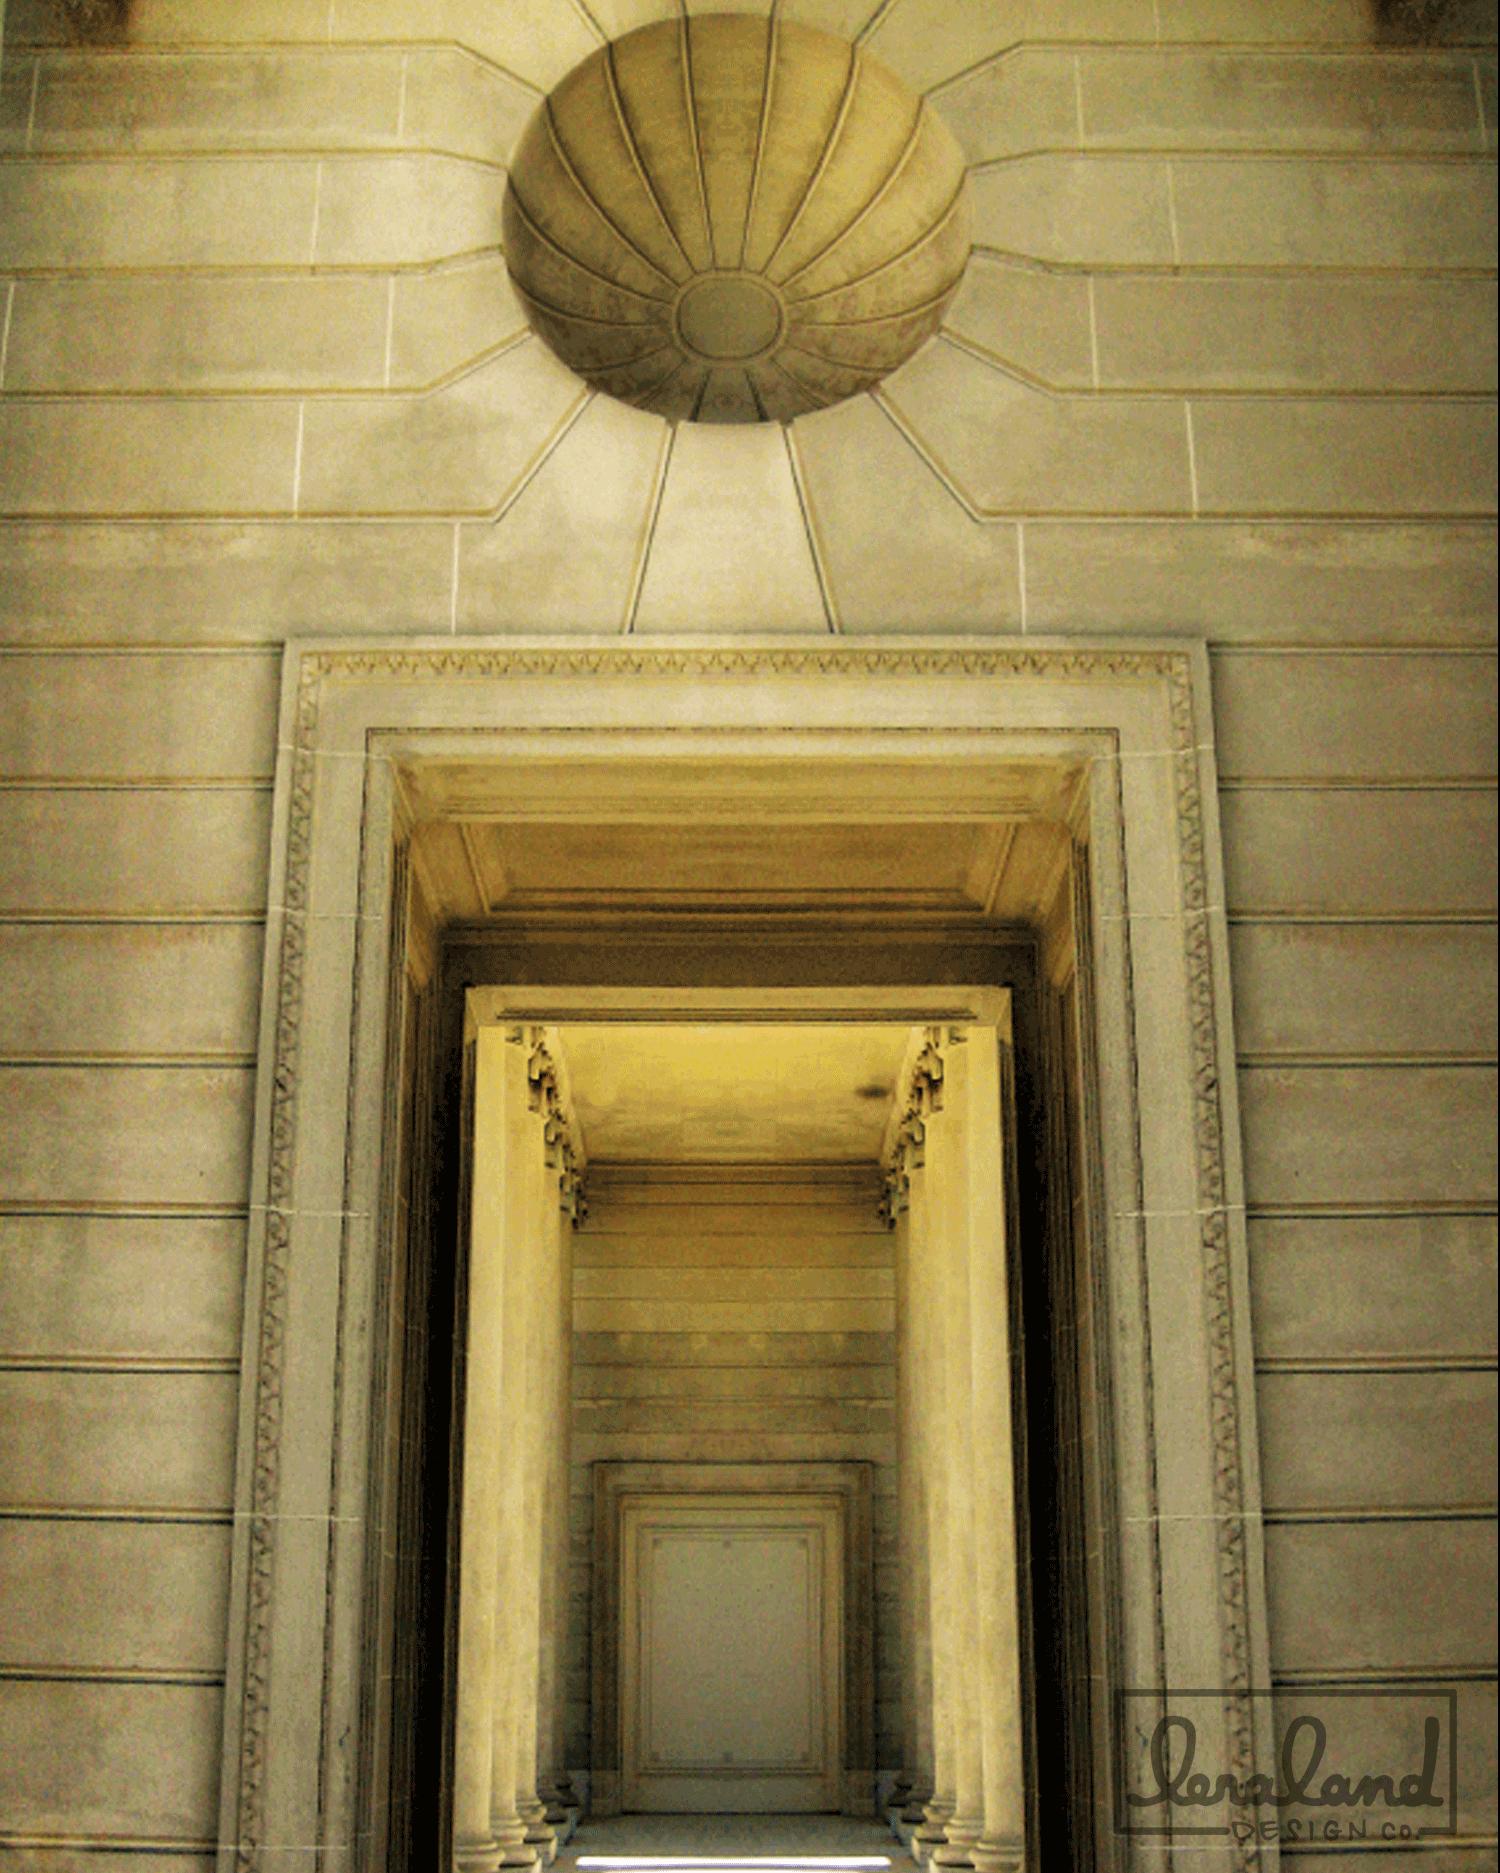 San Francisco Architecture III